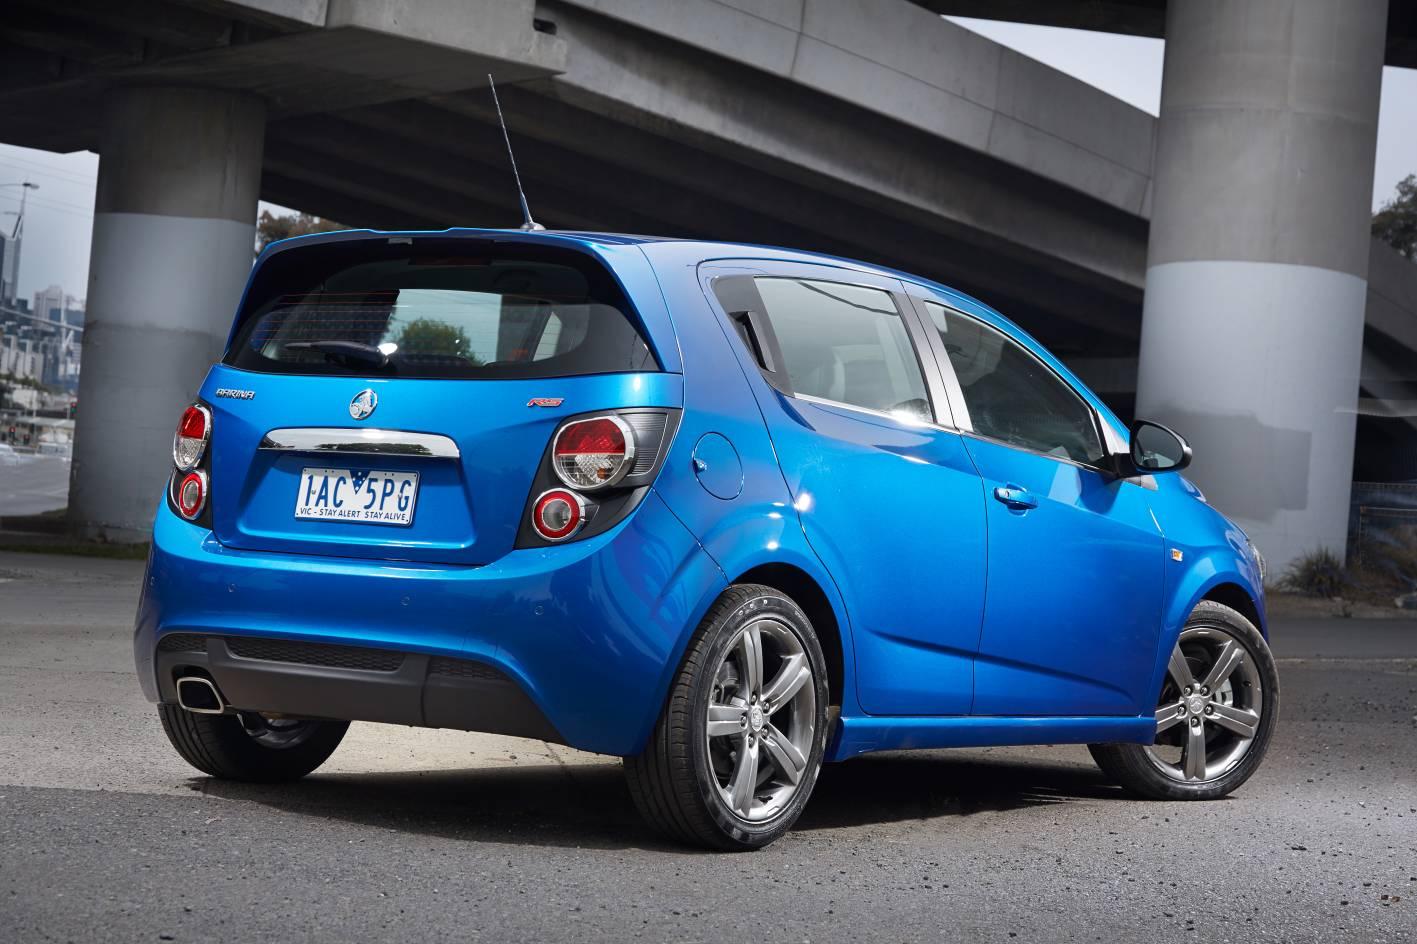 Holden Cars News Turbocharged 2014 Holden Barina Rs